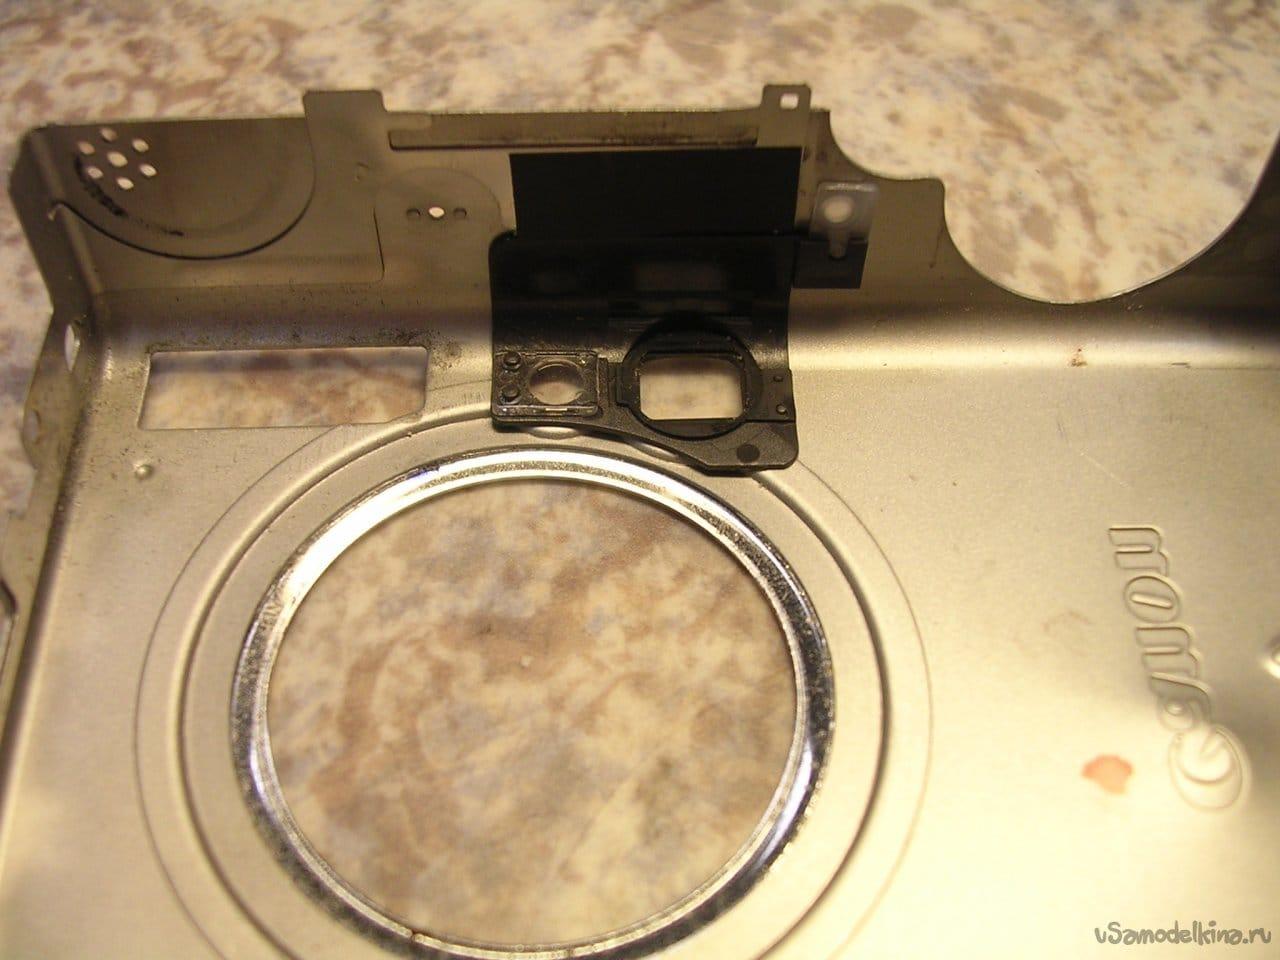 CANON IXUS 400 camera with growl